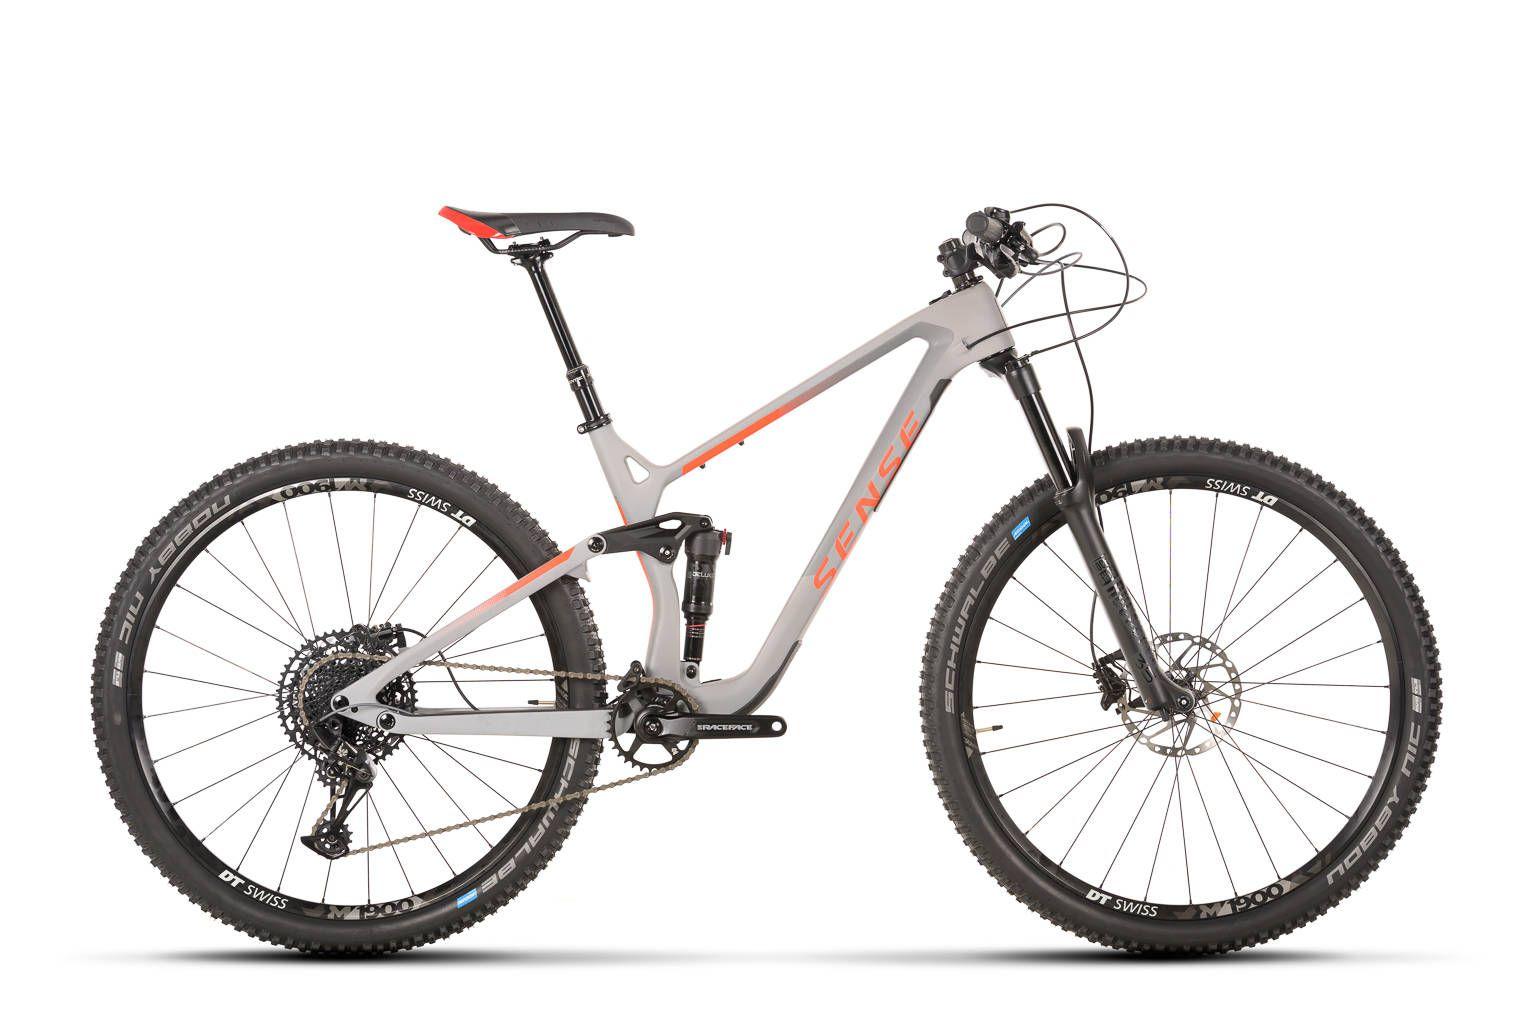 Bicicleta SENSE Exalt Comp 2020 - 12v Sram NG Eagle - Vermelho Neon/Cinza